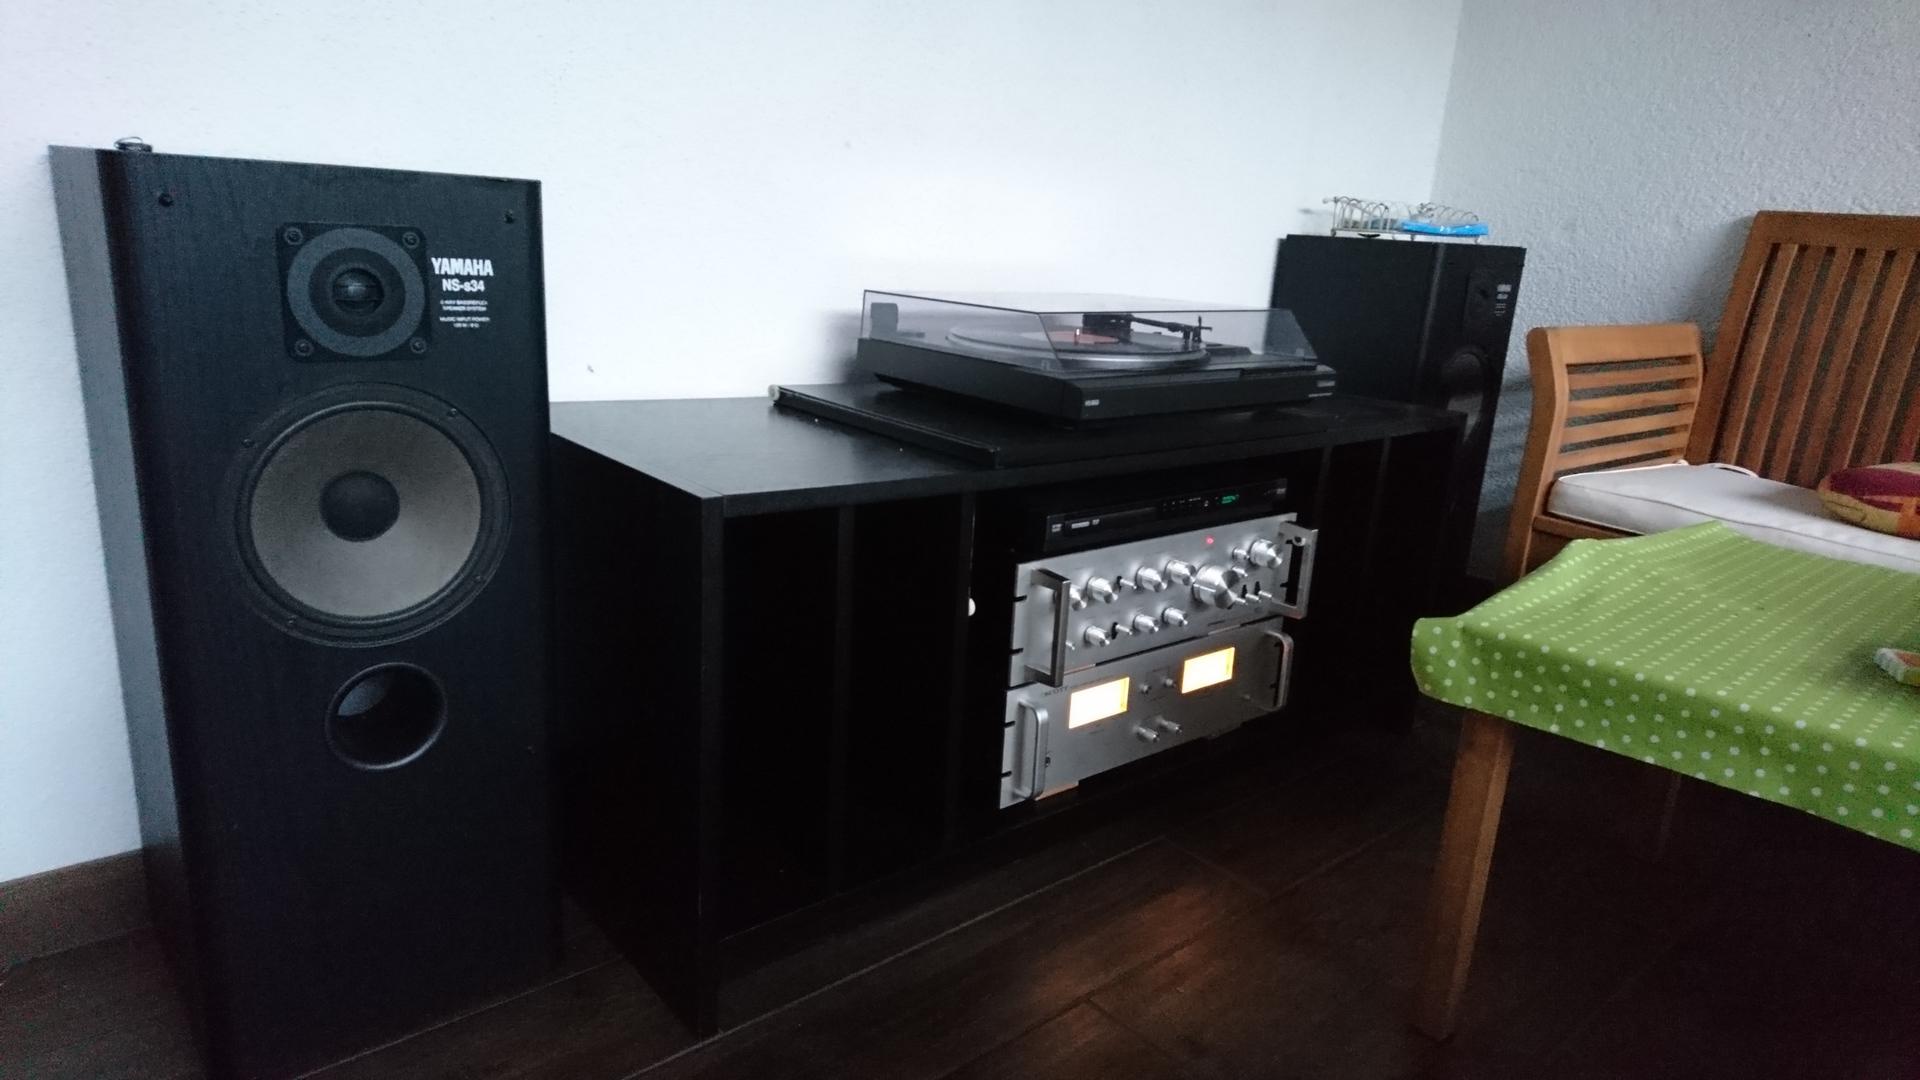 bild pioneer und scott hifiklassiker pioneer scott stereo hifi bildergalerie. Black Bedroom Furniture Sets. Home Design Ideas